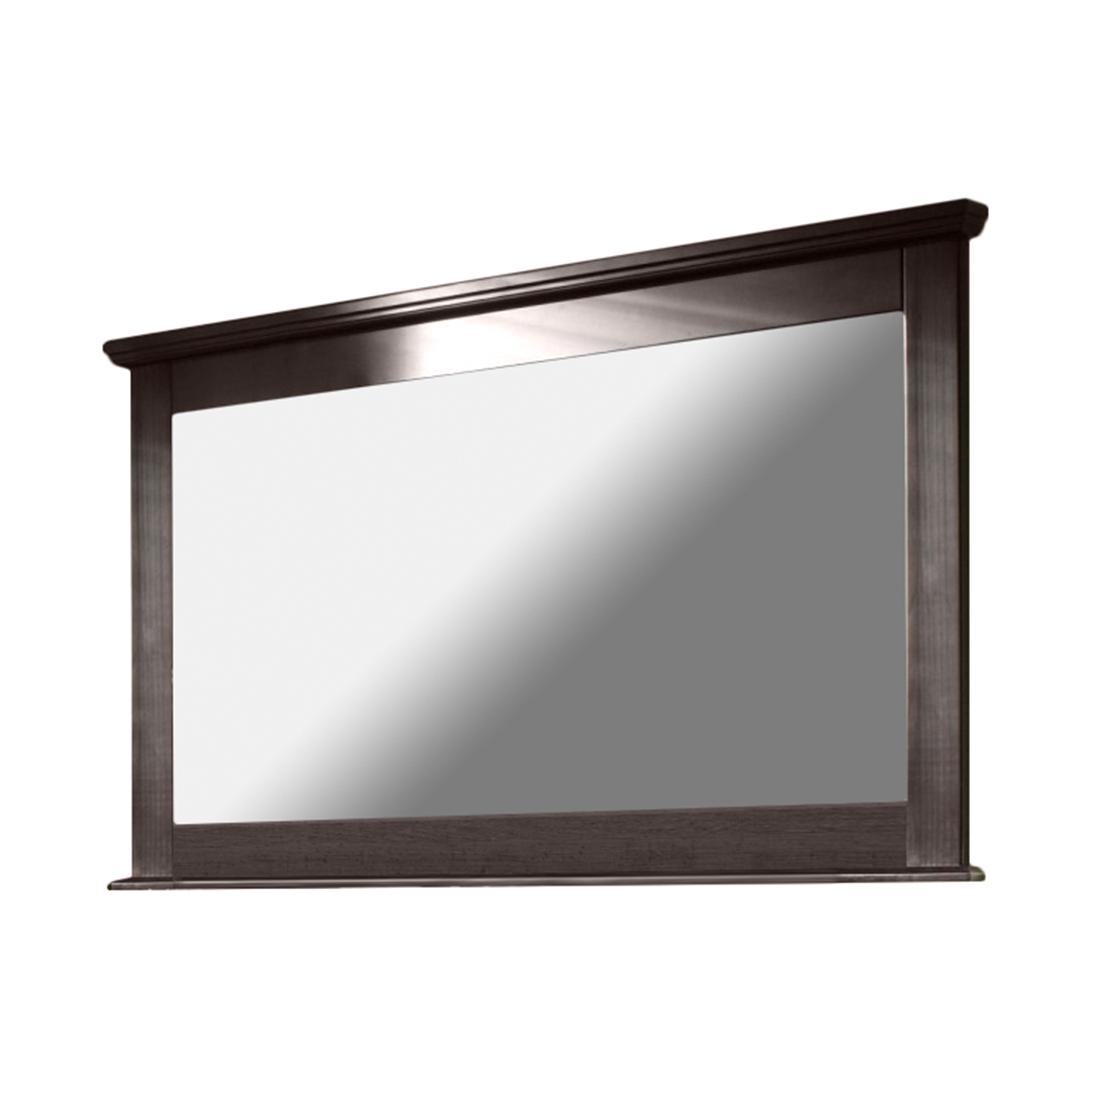 spiegel wandspiegel kolonialstil kiefer massiv garderobenspiegel esszimmer neu ebay. Black Bedroom Furniture Sets. Home Design Ideas